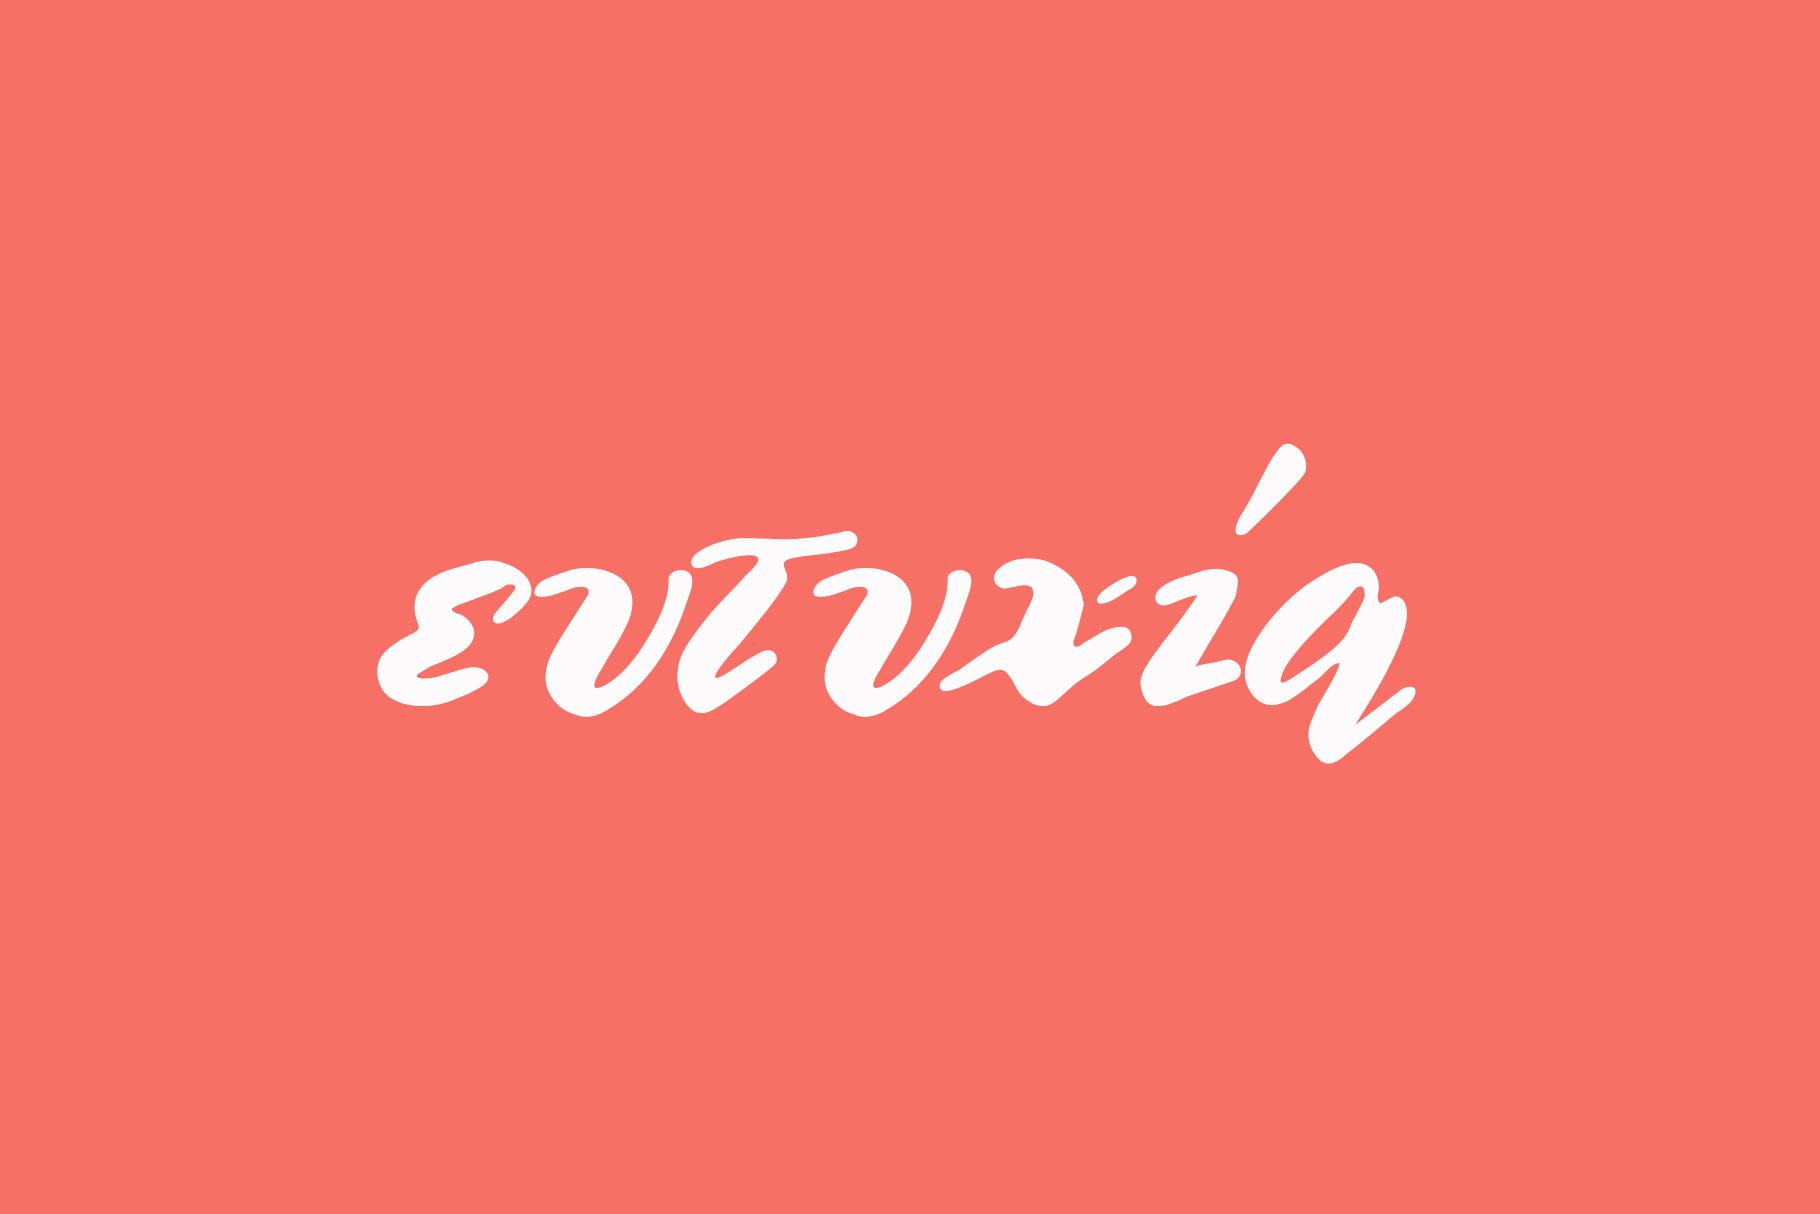 Multilingual Brush Font- Naquia Font example image 13